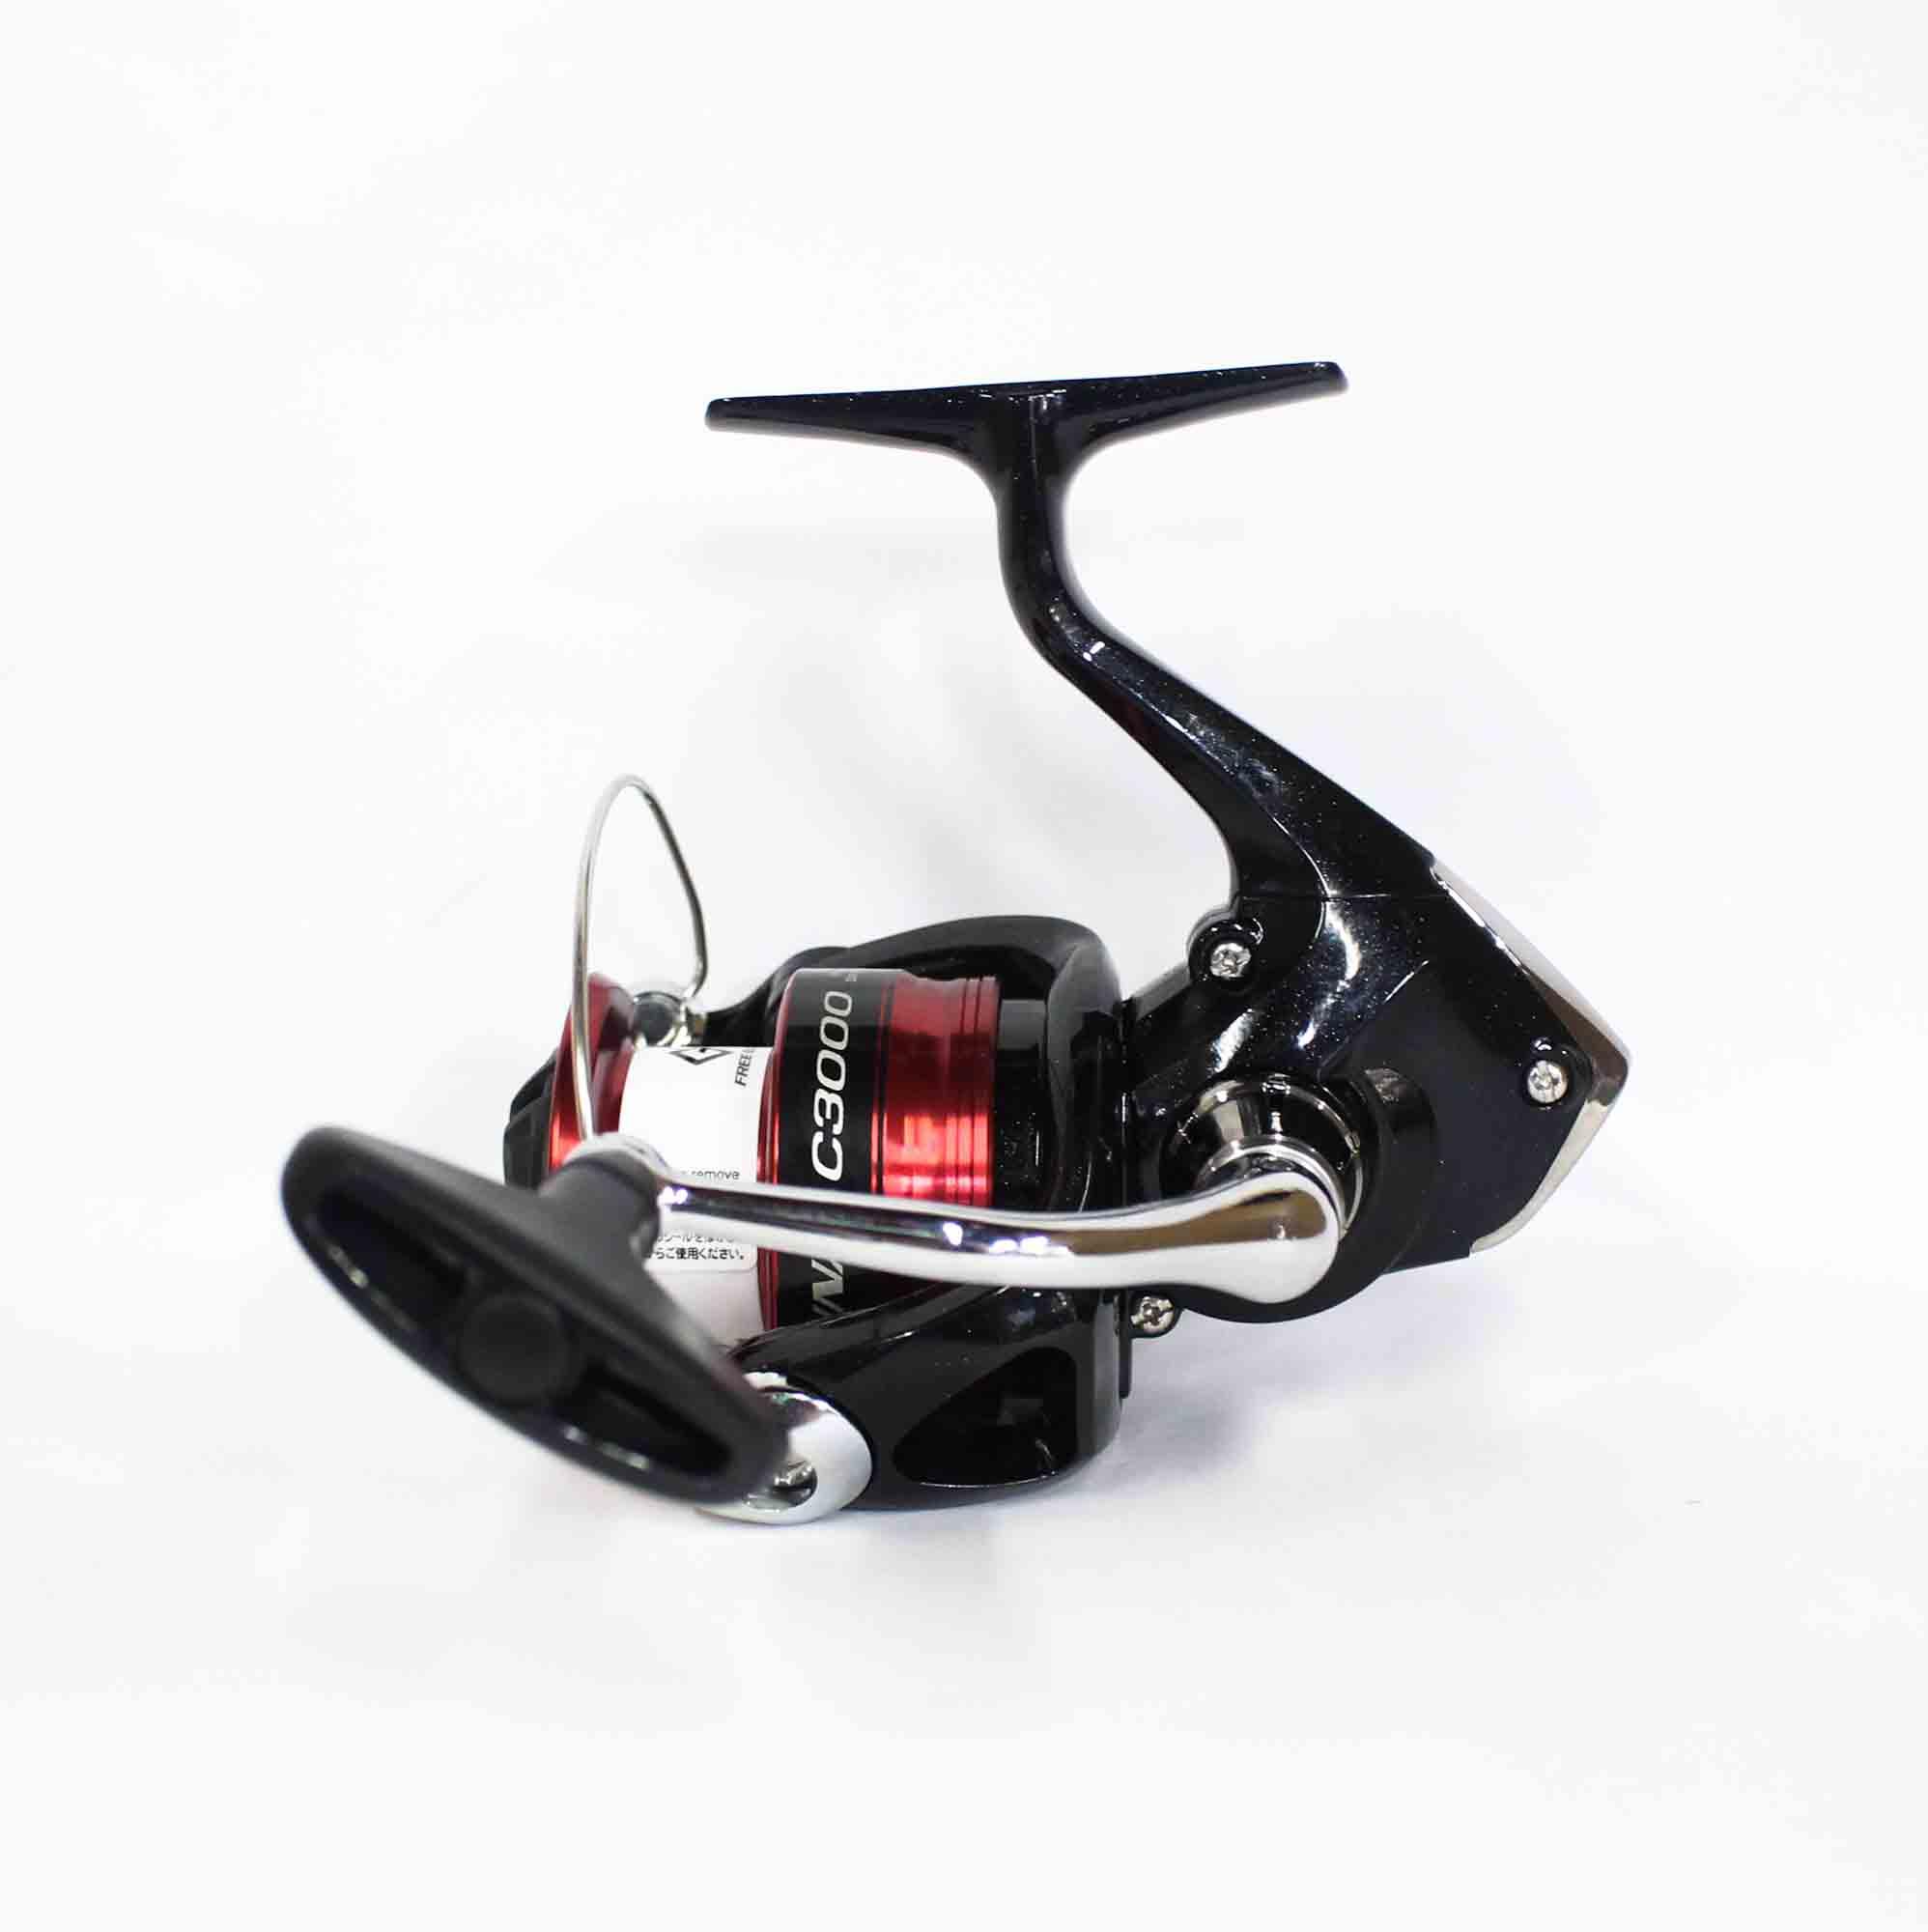 Shimano Reel Spinning Sienna FG C3000 (2654)